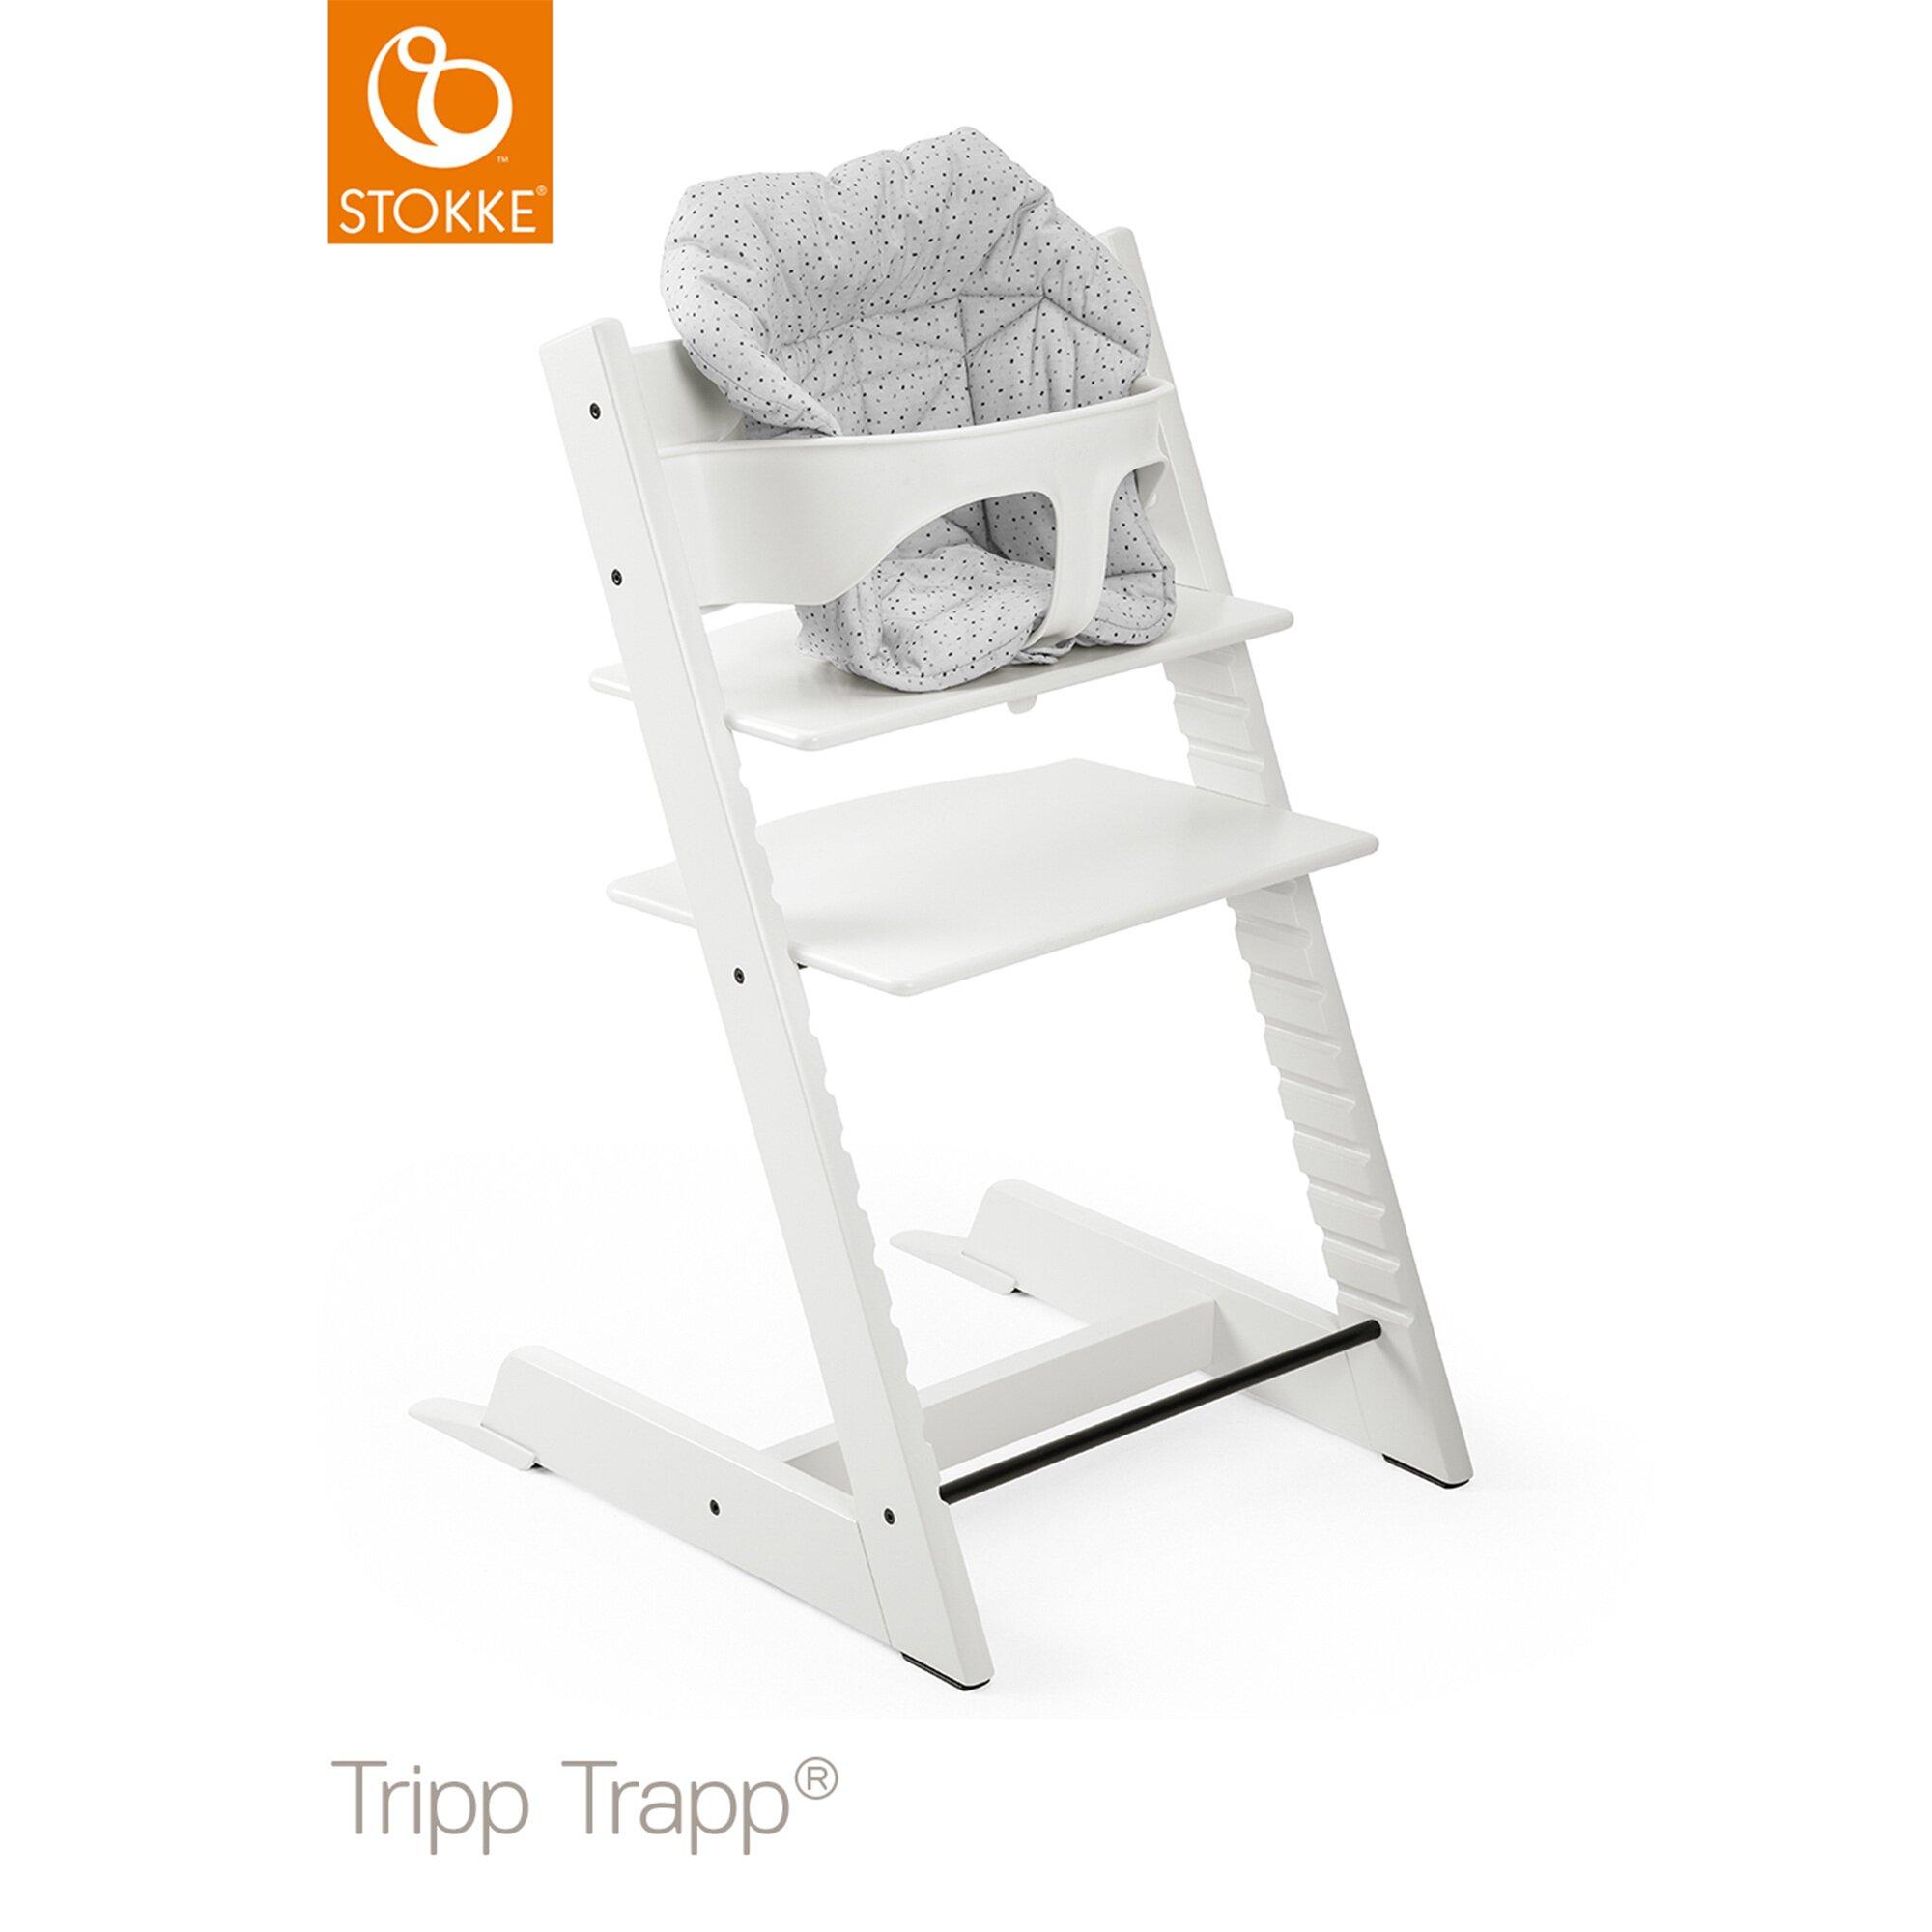 tripp-trapp-sitzkissen-cushion-fur-tripp-trapp